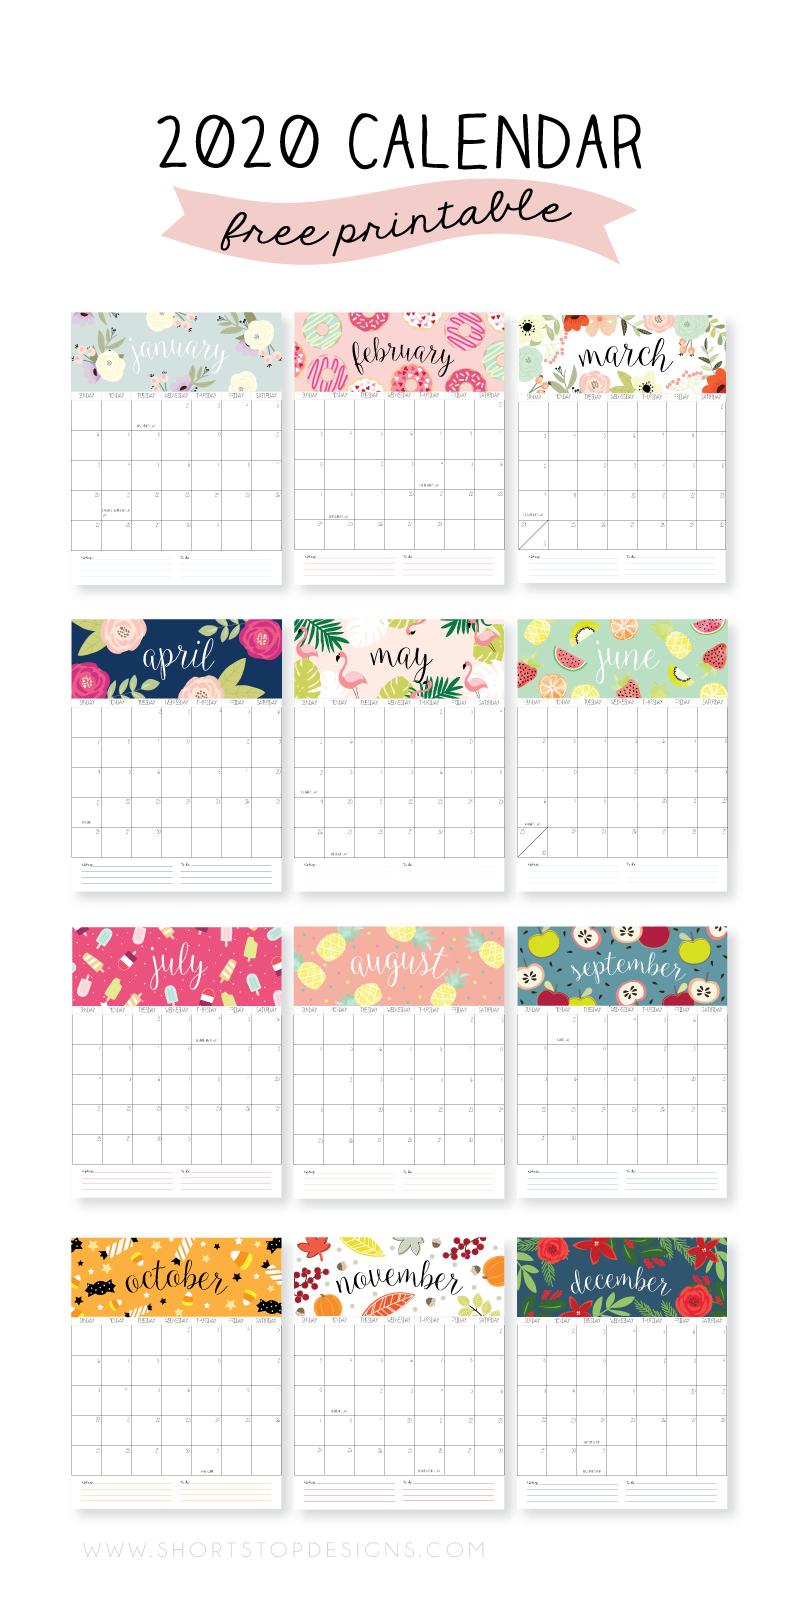 2020 Printable Calendar – Short Stop Designs Short Timers Calendar Printable